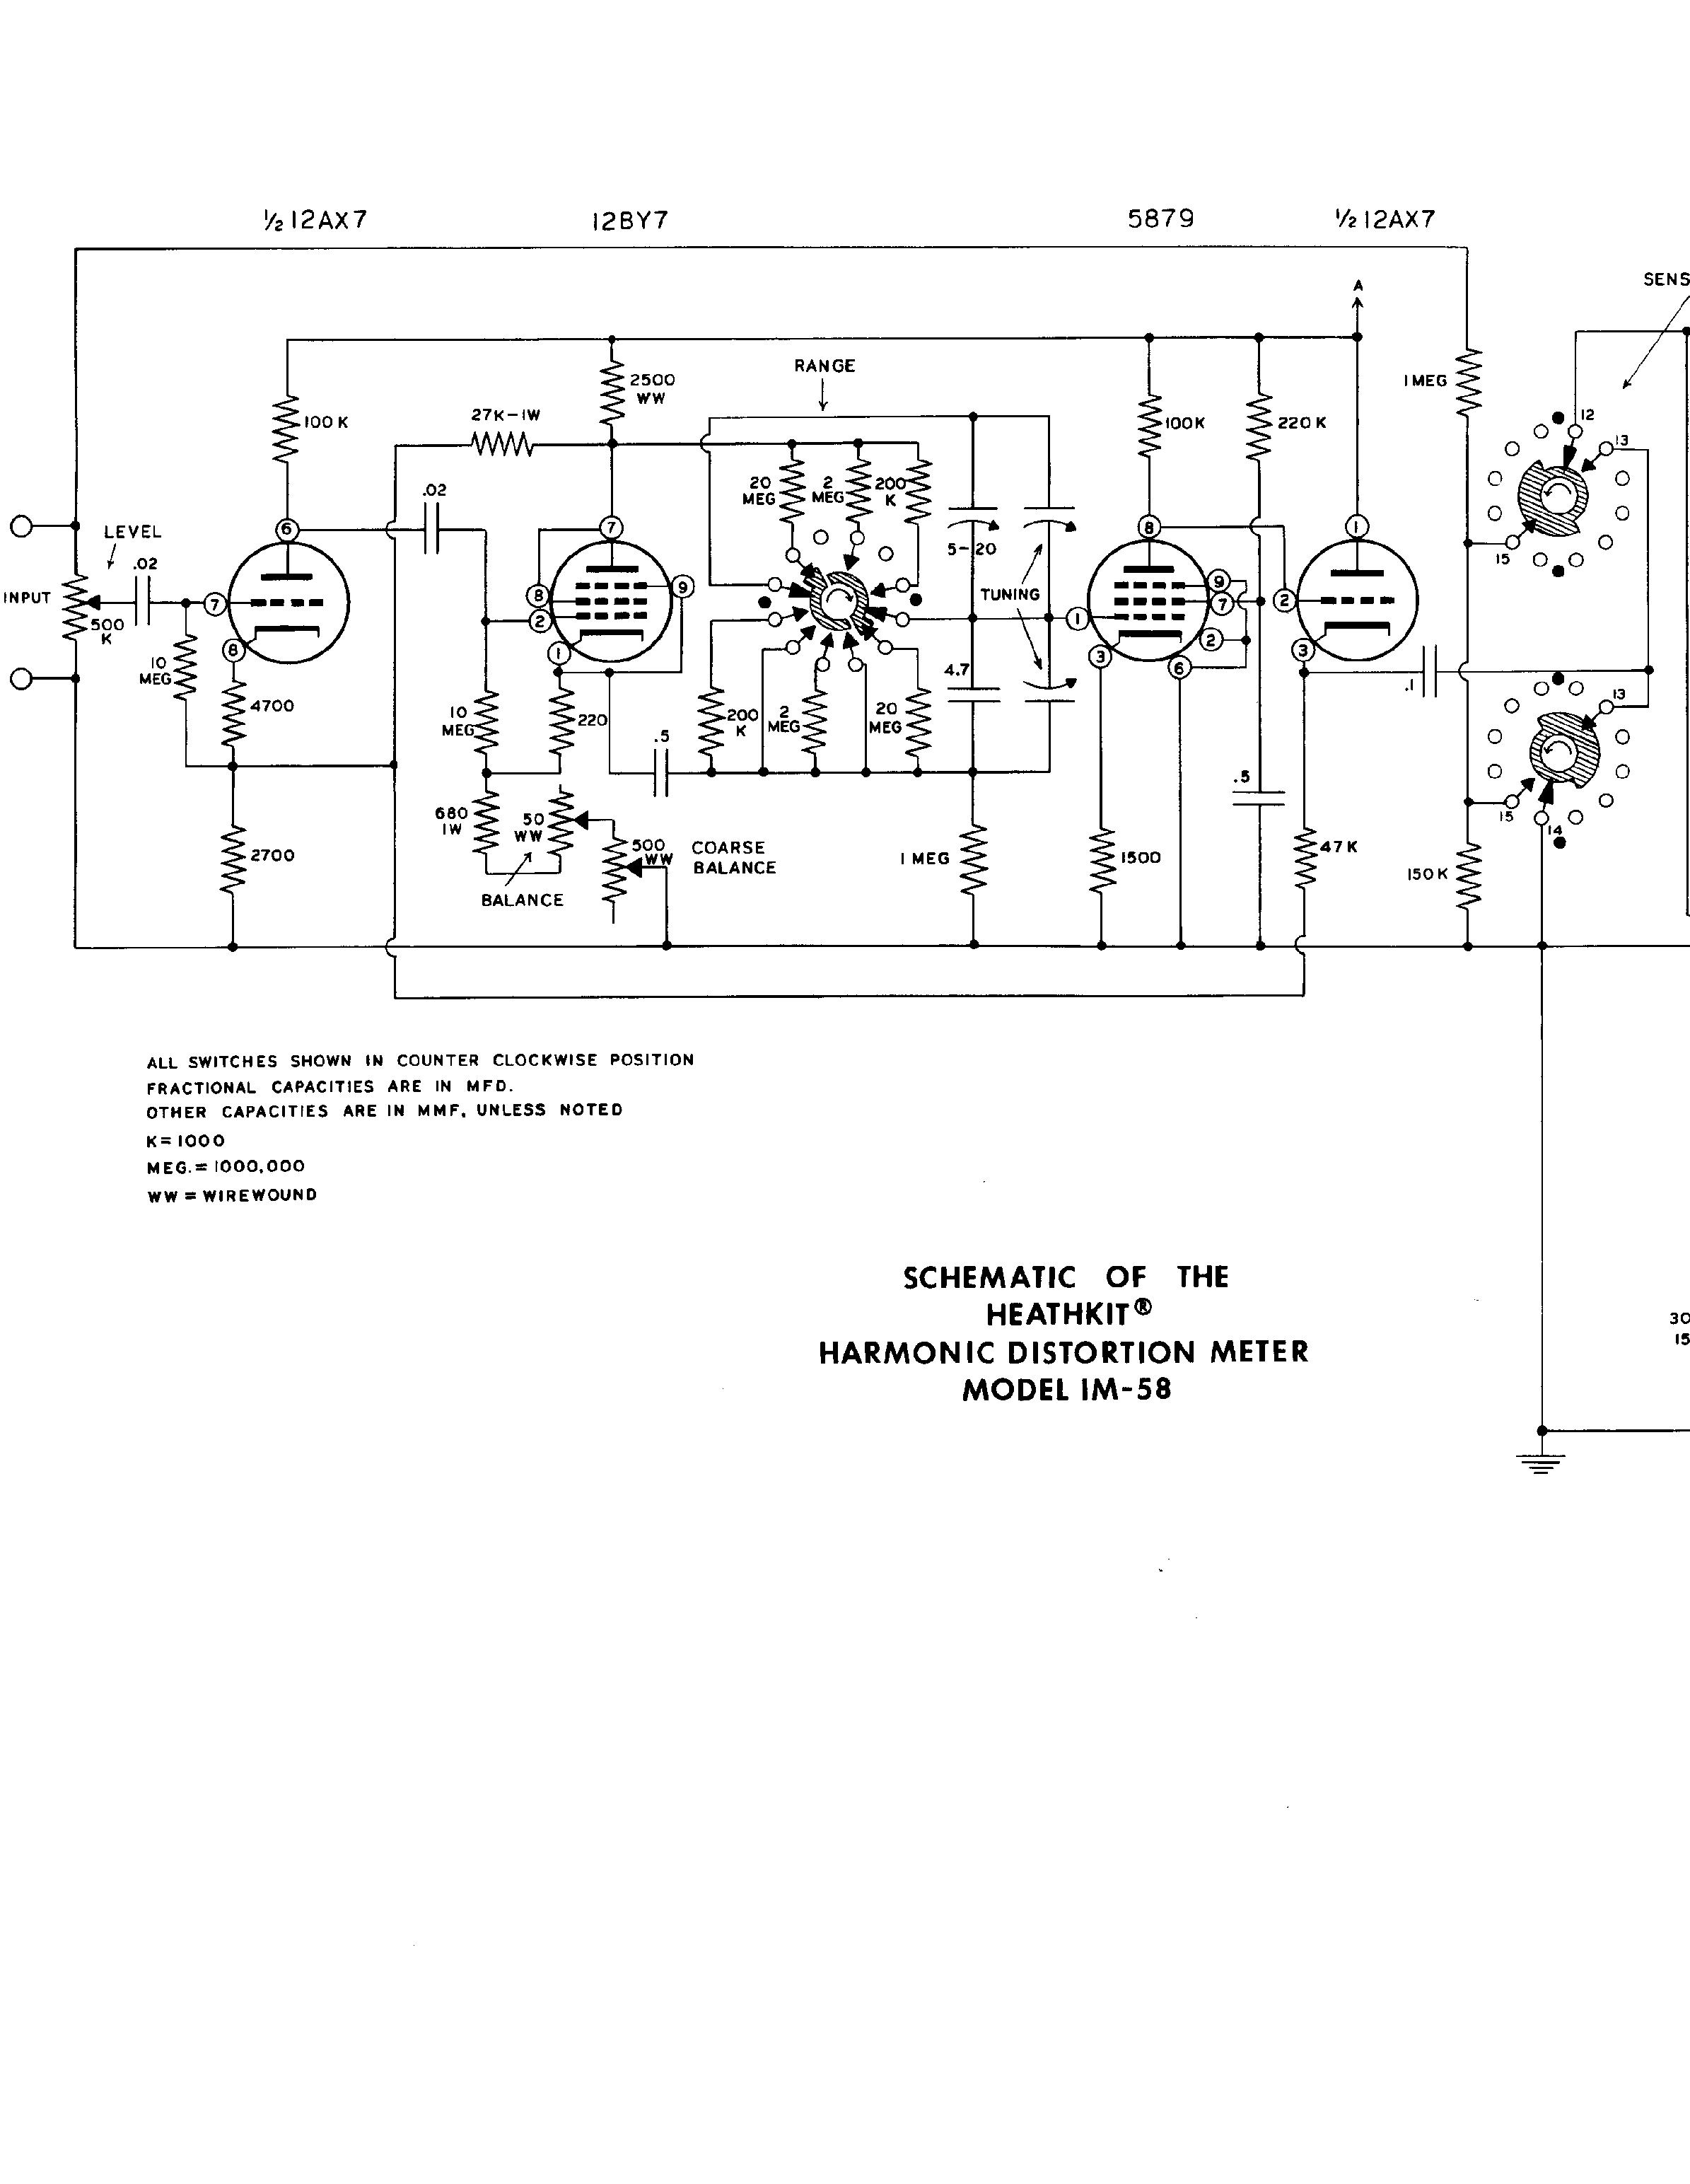 Harmonic Distortion Heathkit Im 58 Harmonic Distortion Meter Sch Service Manual